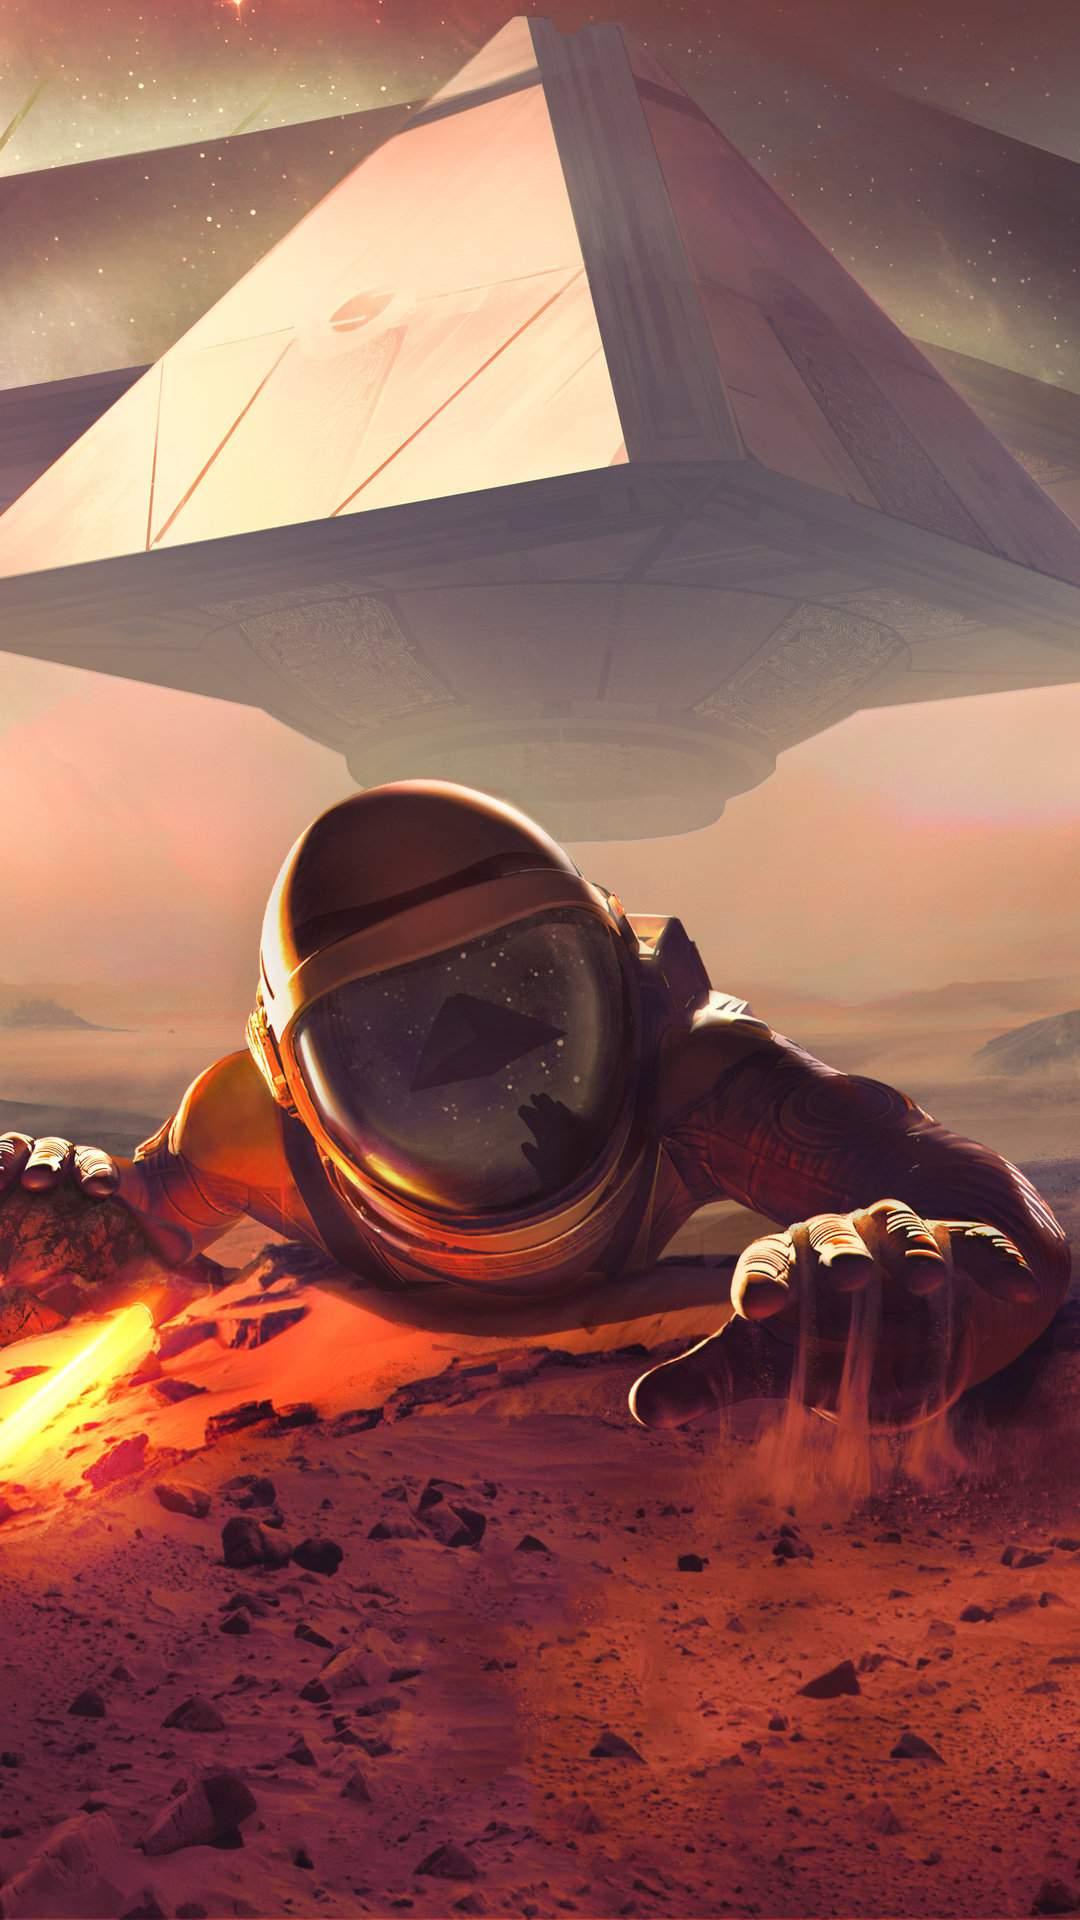 Astronaut Mars Mission iPhone Wallpaper